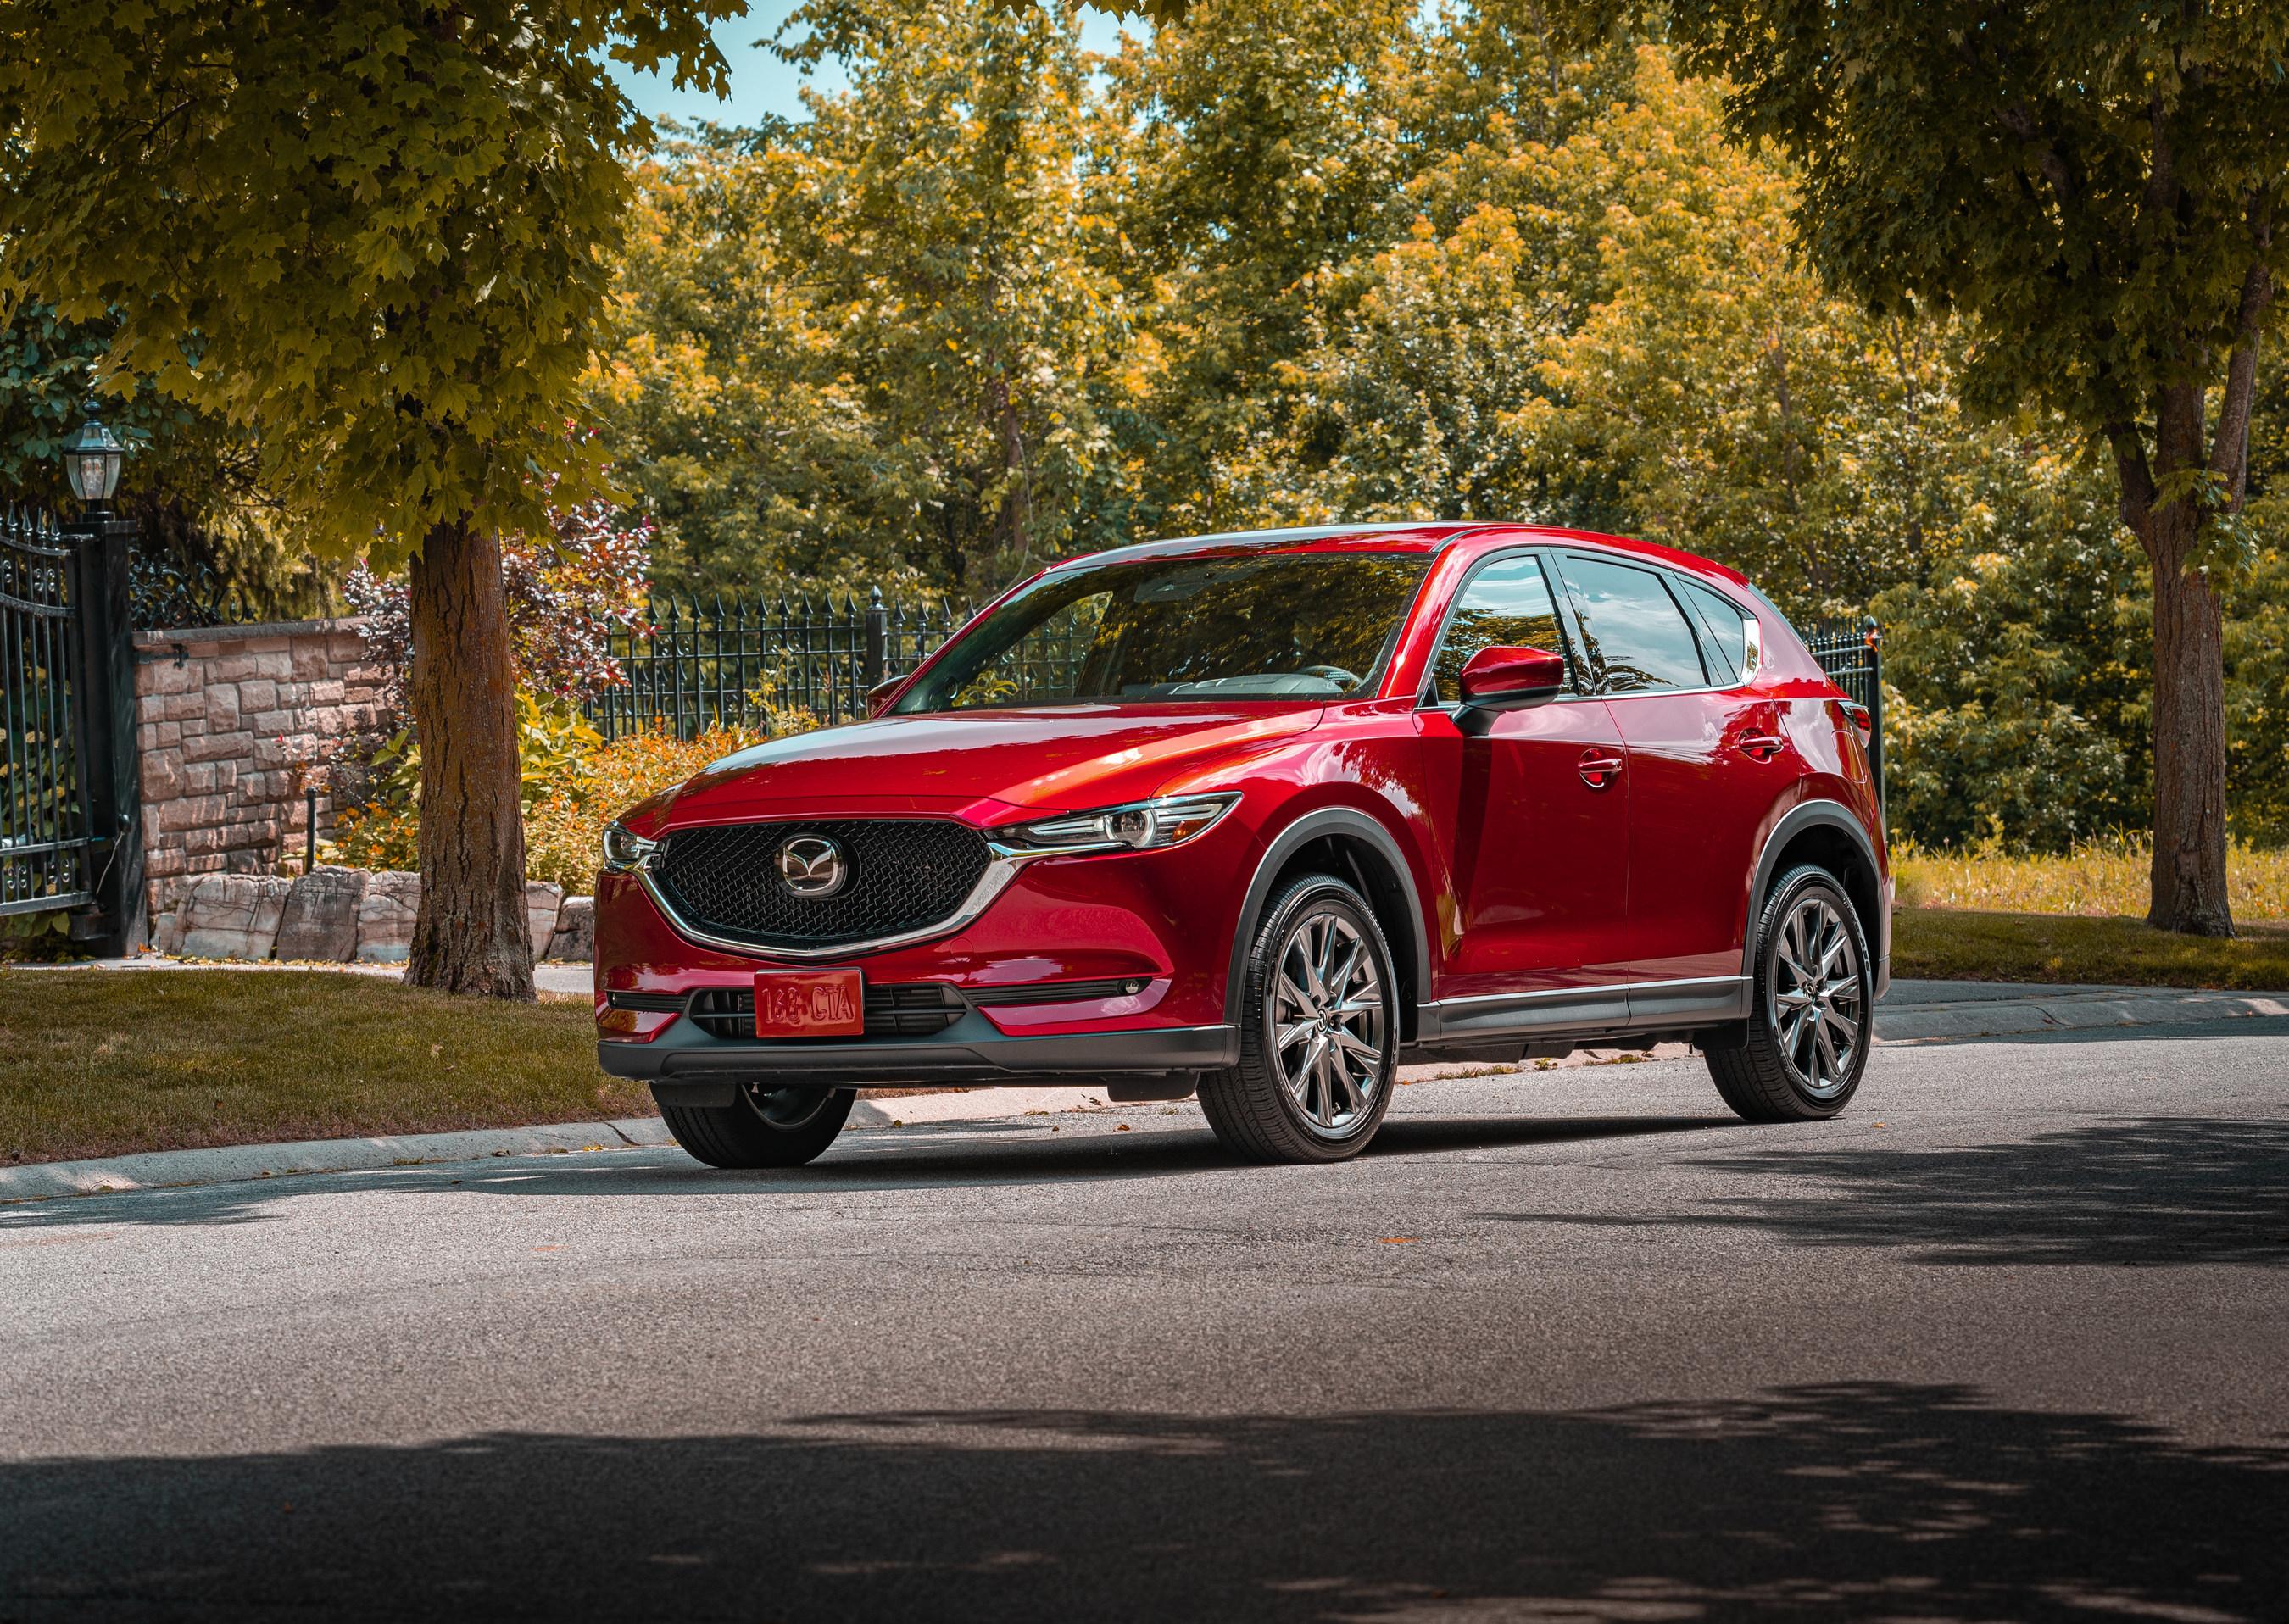 Kelebihan Kekurangan Mazda 2020 Review